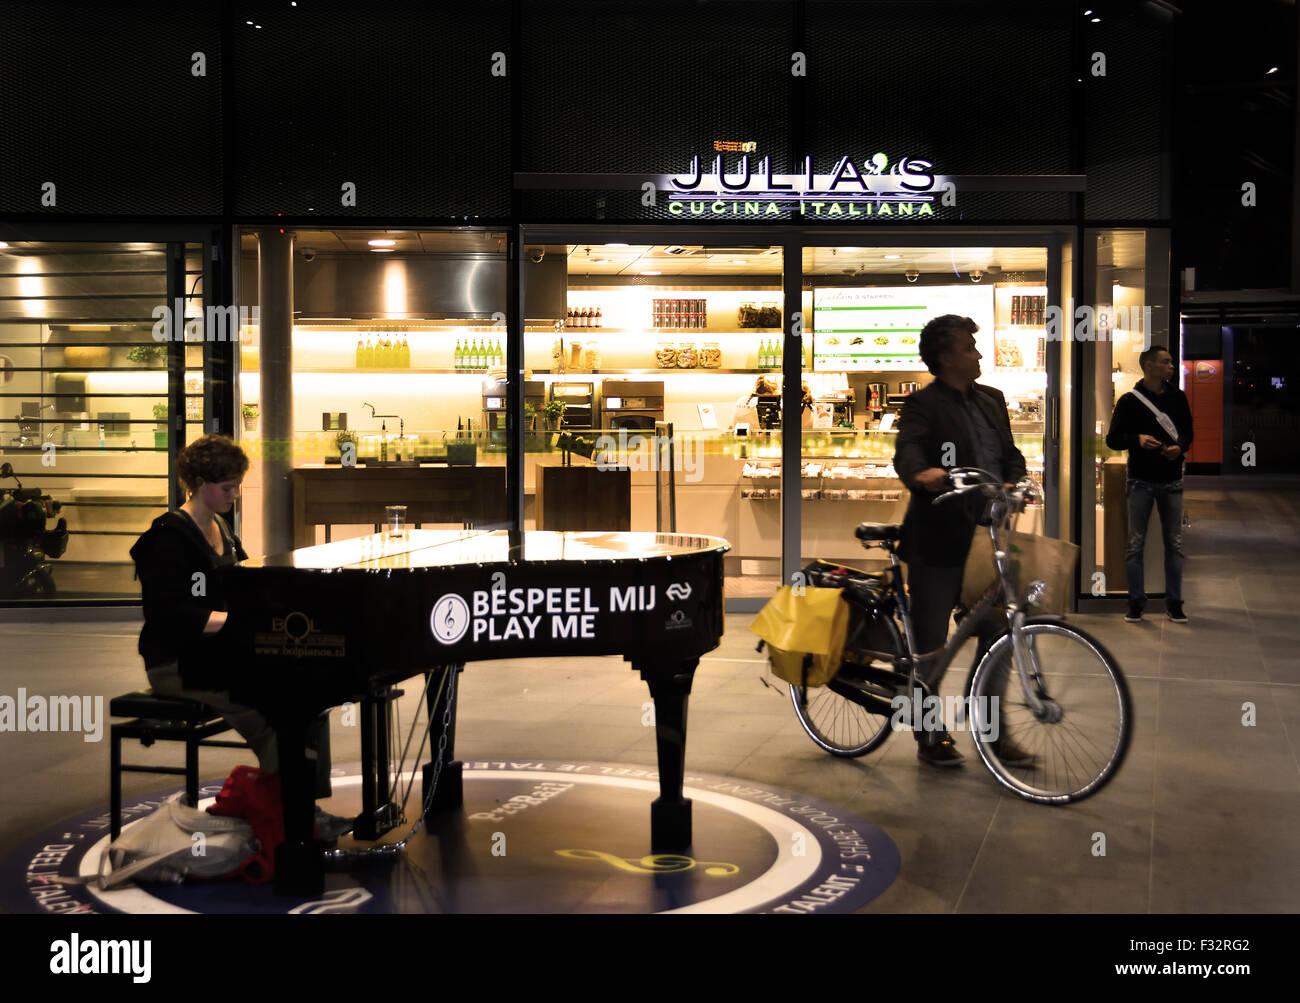 Moi bespeel ( jouer du piano sur moi ) Centraal Station La Haye Pays-Bas Dutch frree Music ( dans le grand hall Photo Stock